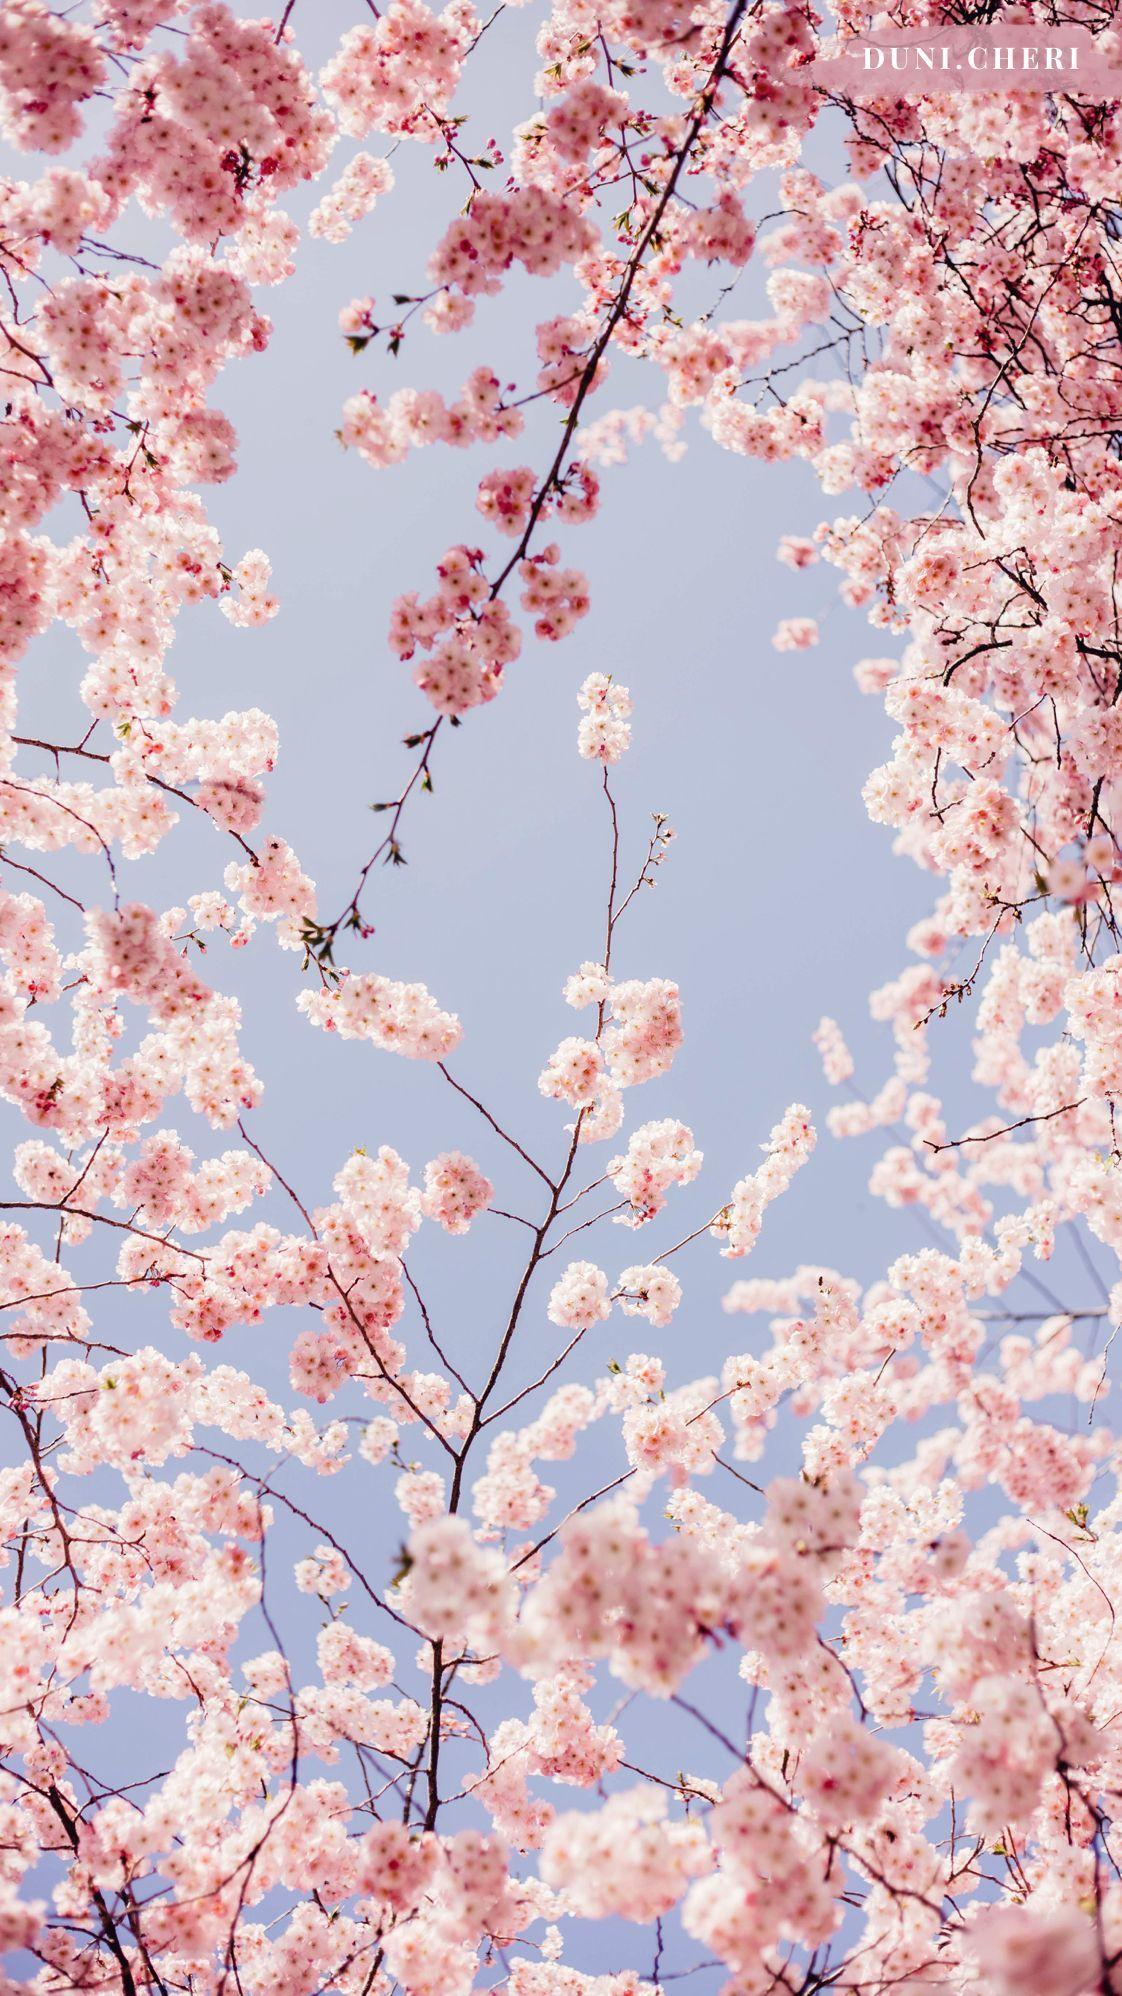 Pin En Un N T U R E In 2020 Cherry Blossom Wallpaper Iphone Background Wallpaper Flower Phone Wallpaper